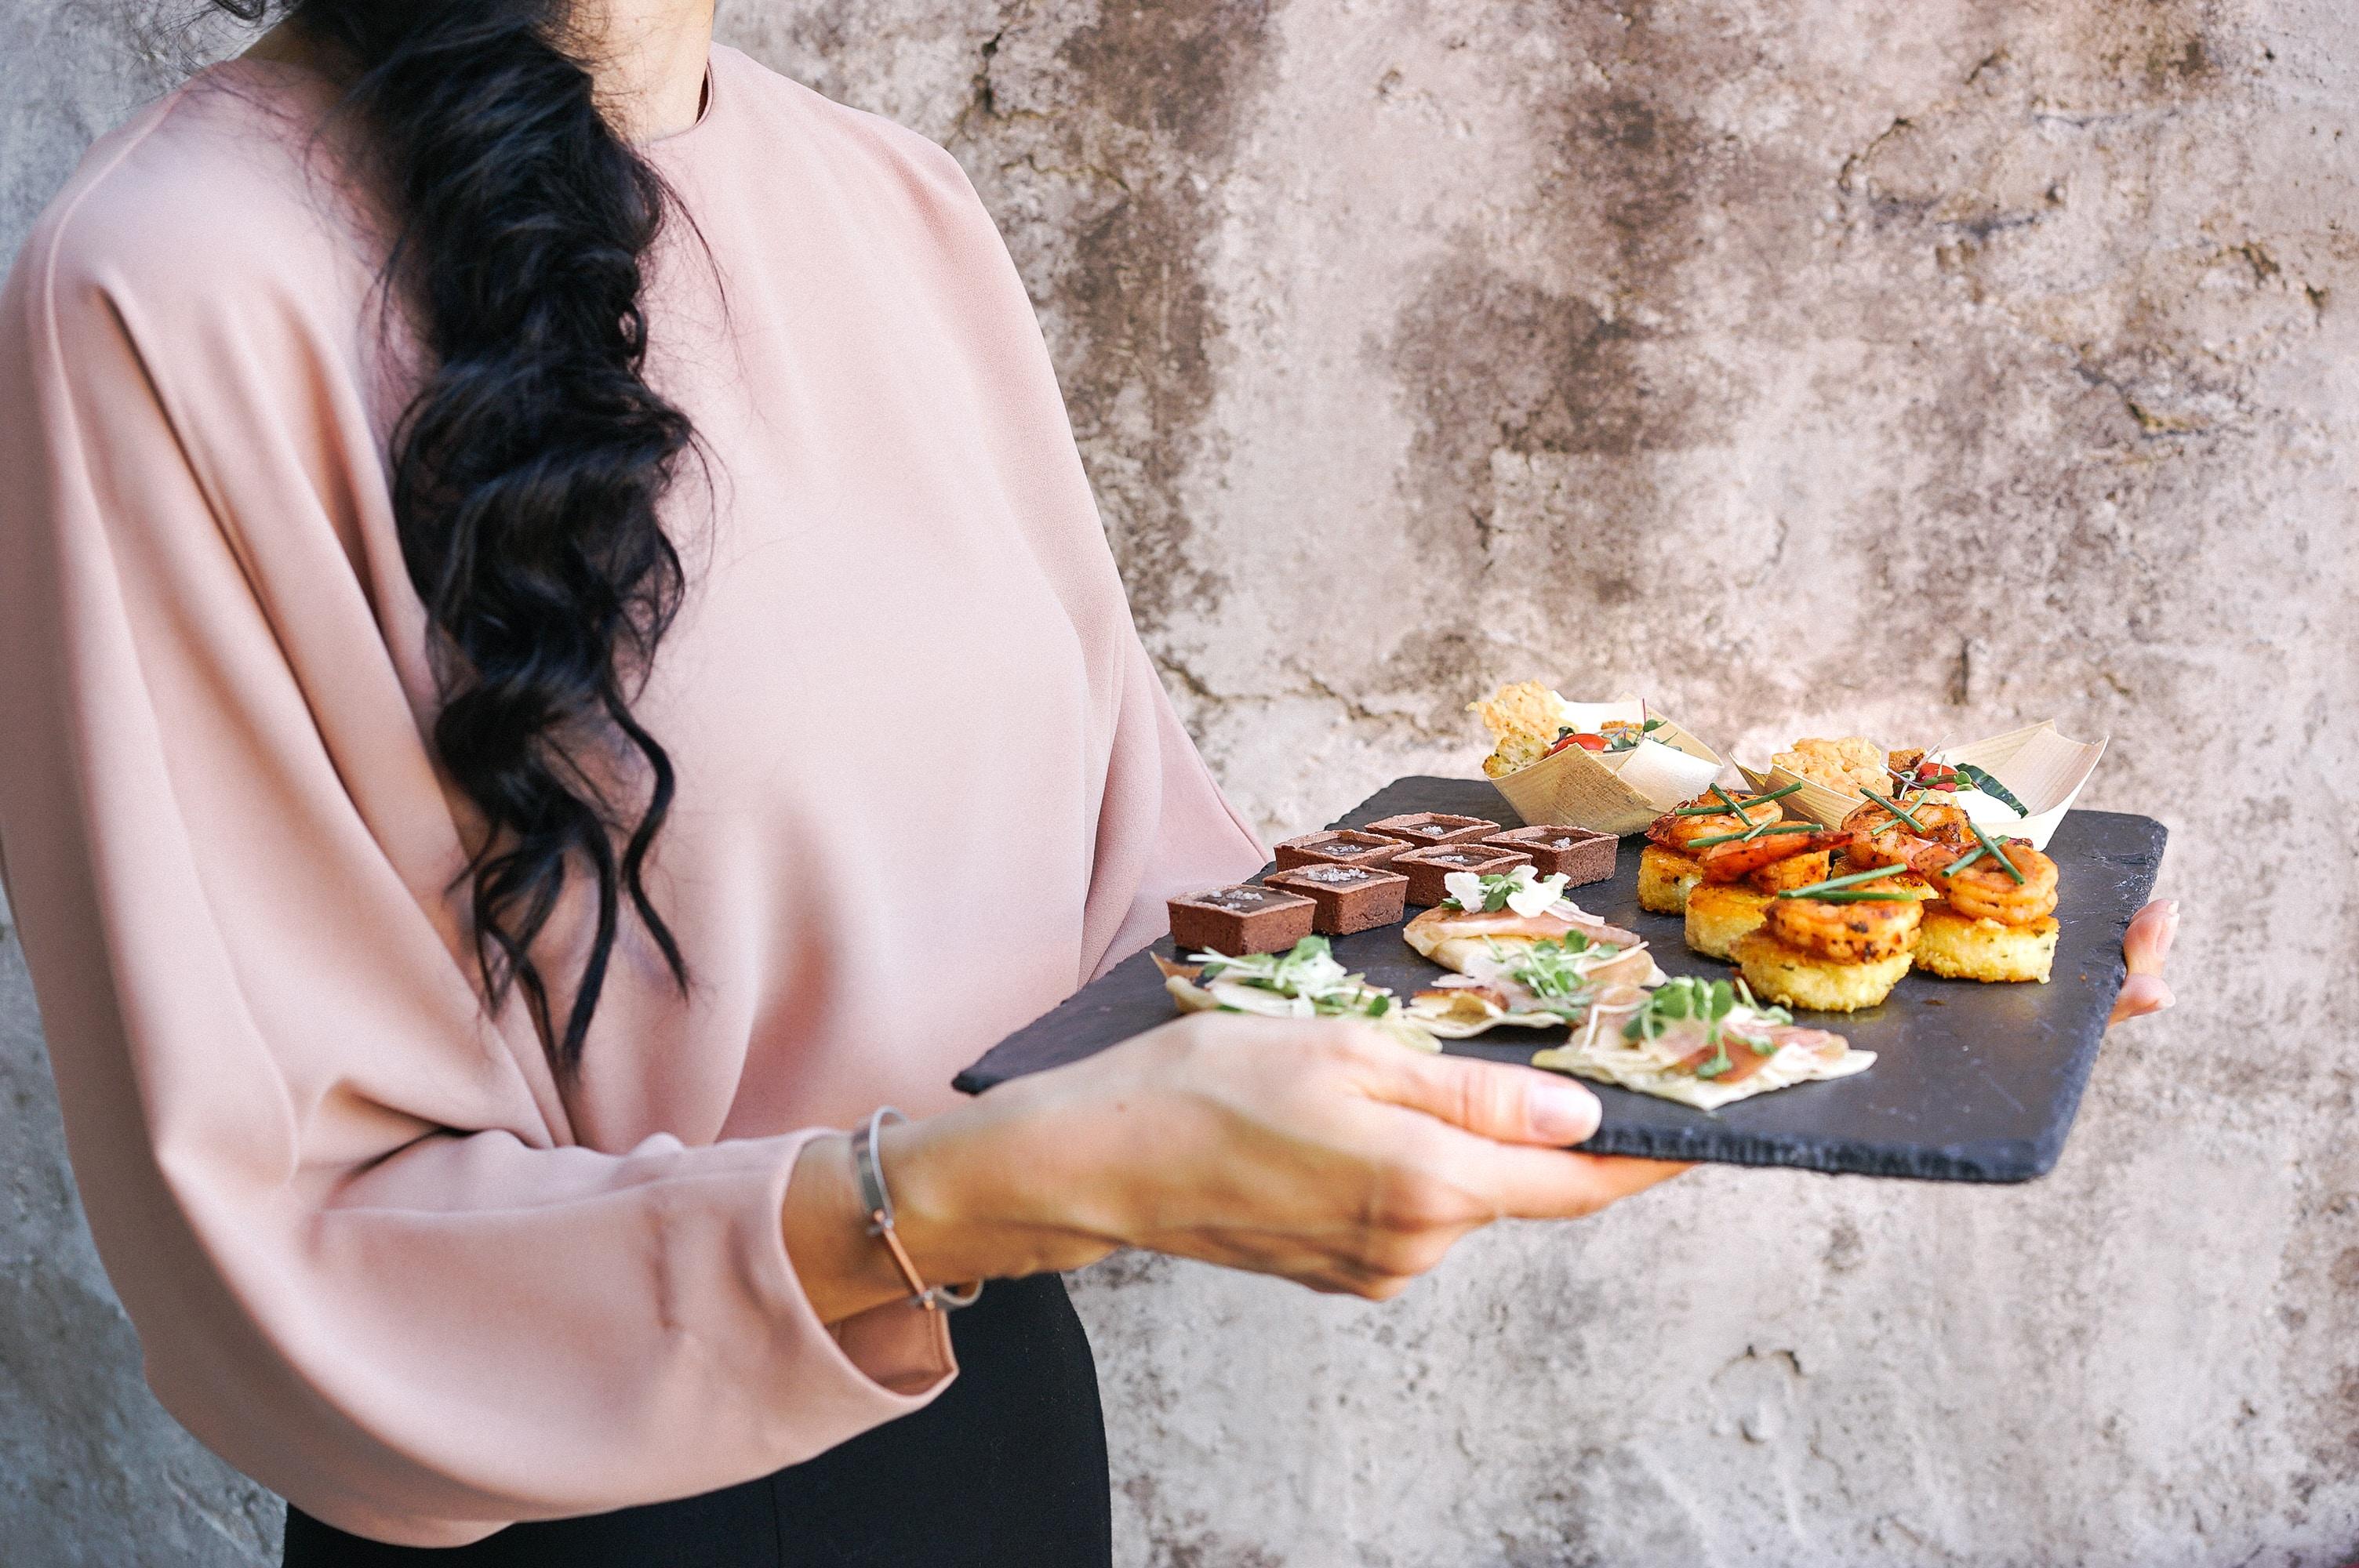 Caribean Restaurant Waiter